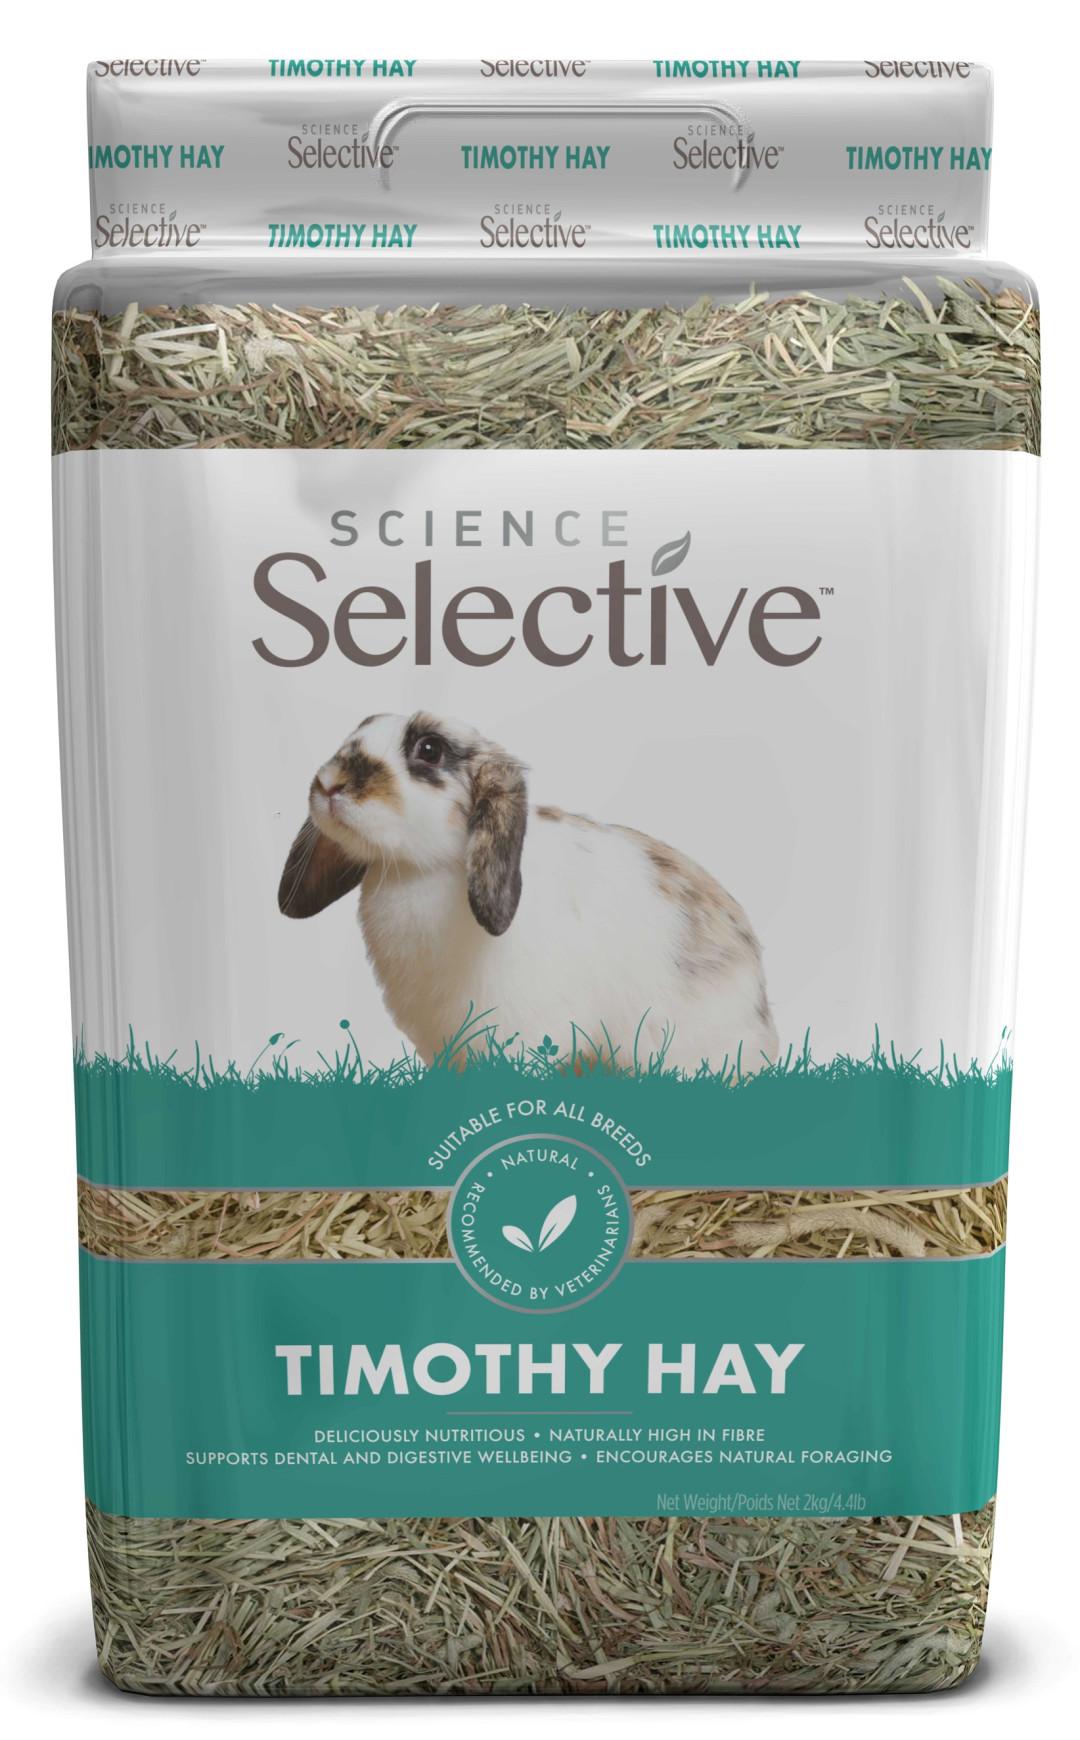 Supreme Science Selective Timothy Hay <br>2 kg